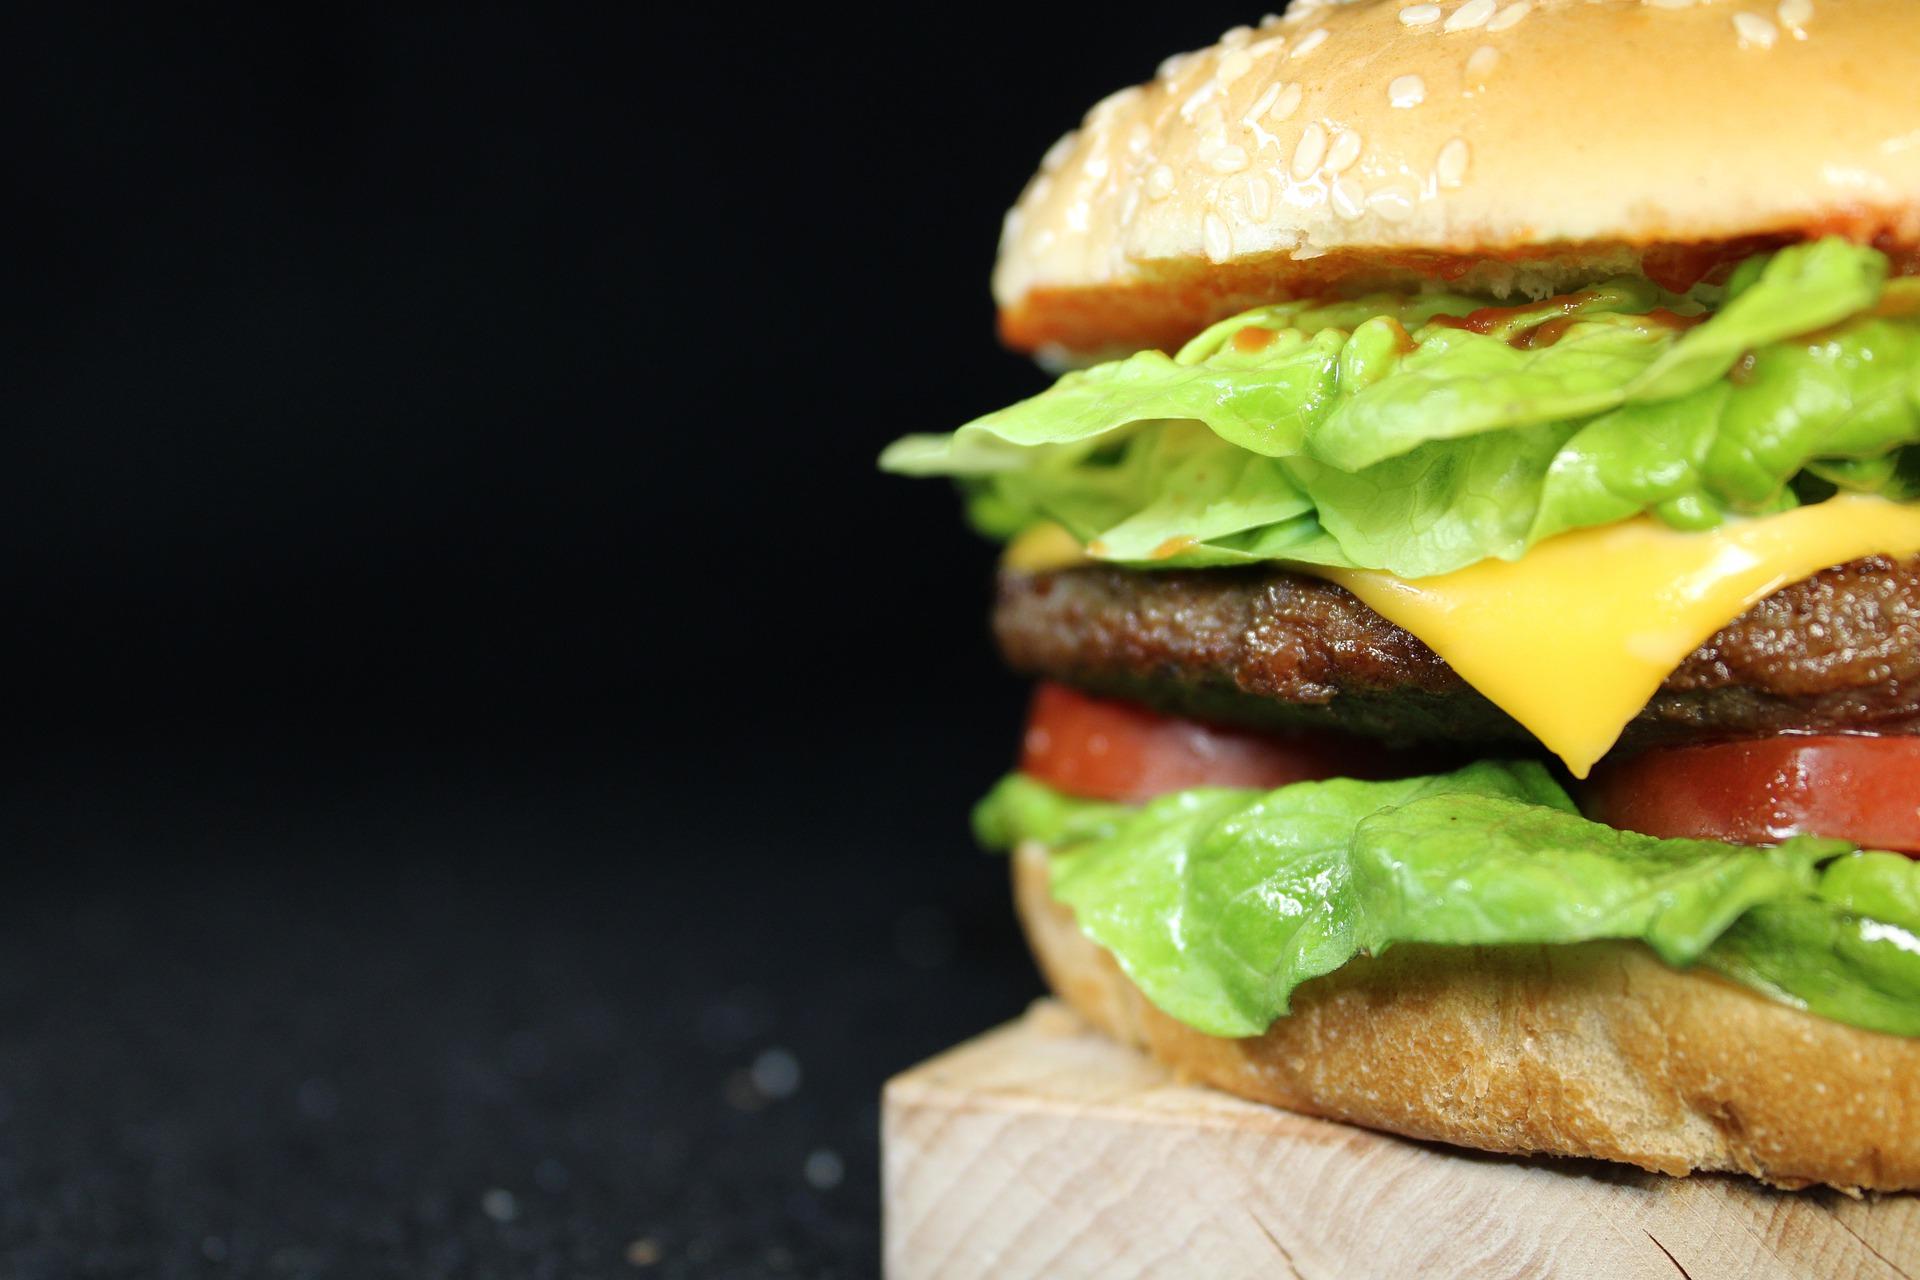 Vemos um sanduíche de fast-food (imagem ilustrativa). Texto: Franquia Burger King.